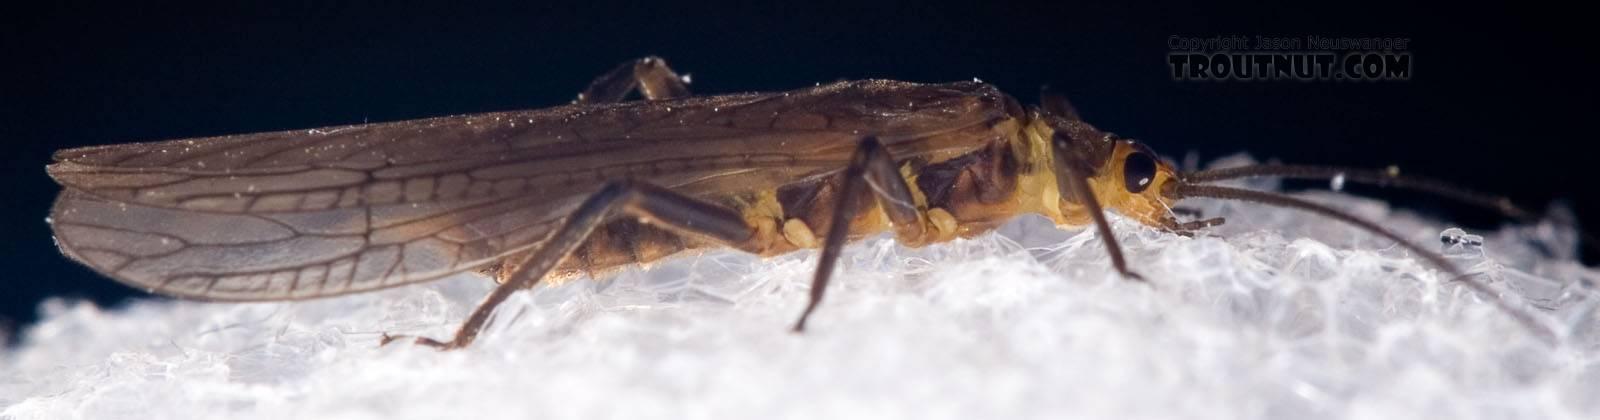 Peltoperlidae (Roachflies) Stonefly Adult from Mystery Creek #42 in Pennsylvania